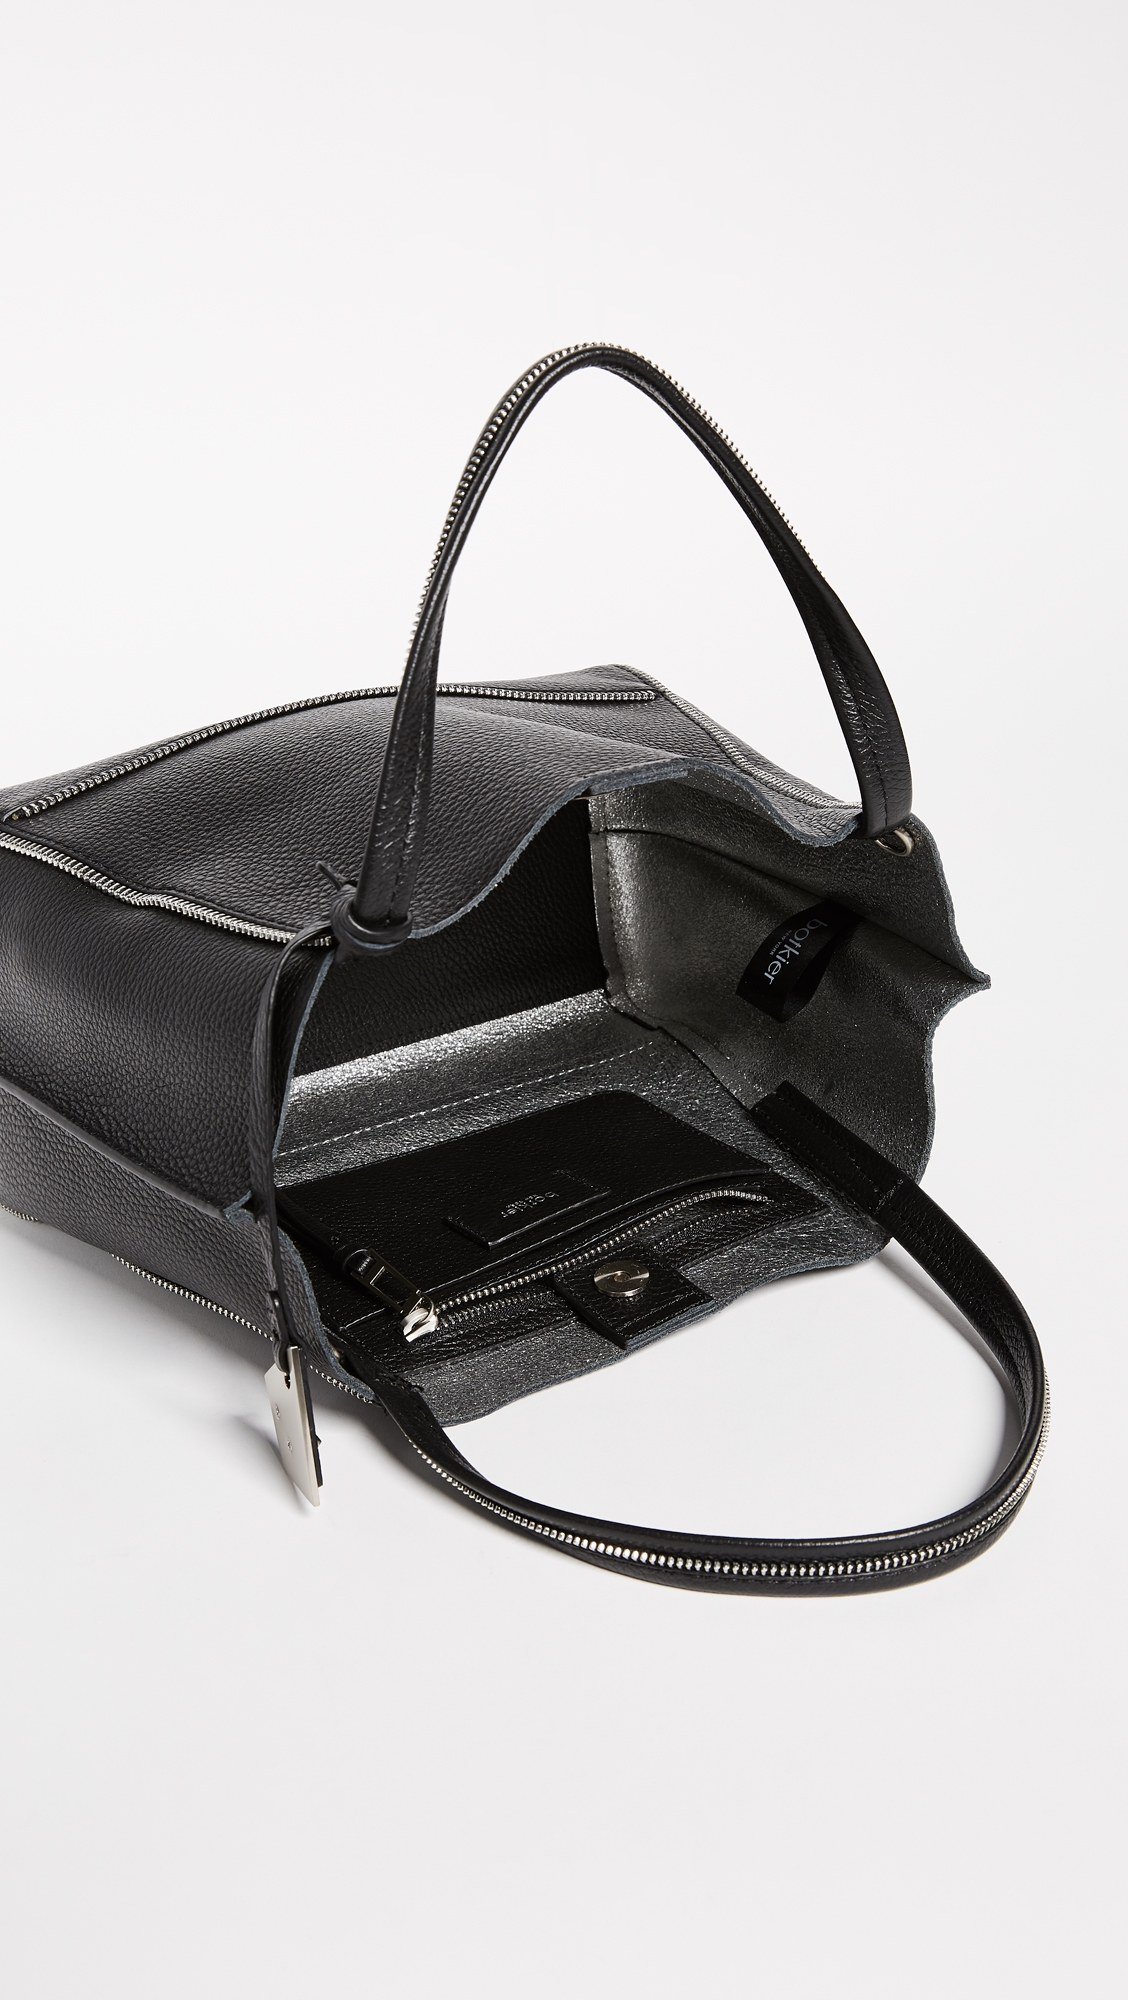 Объемная сумка с короткими ручками East / West Soho Botkier  (BOTKI4027812867314)